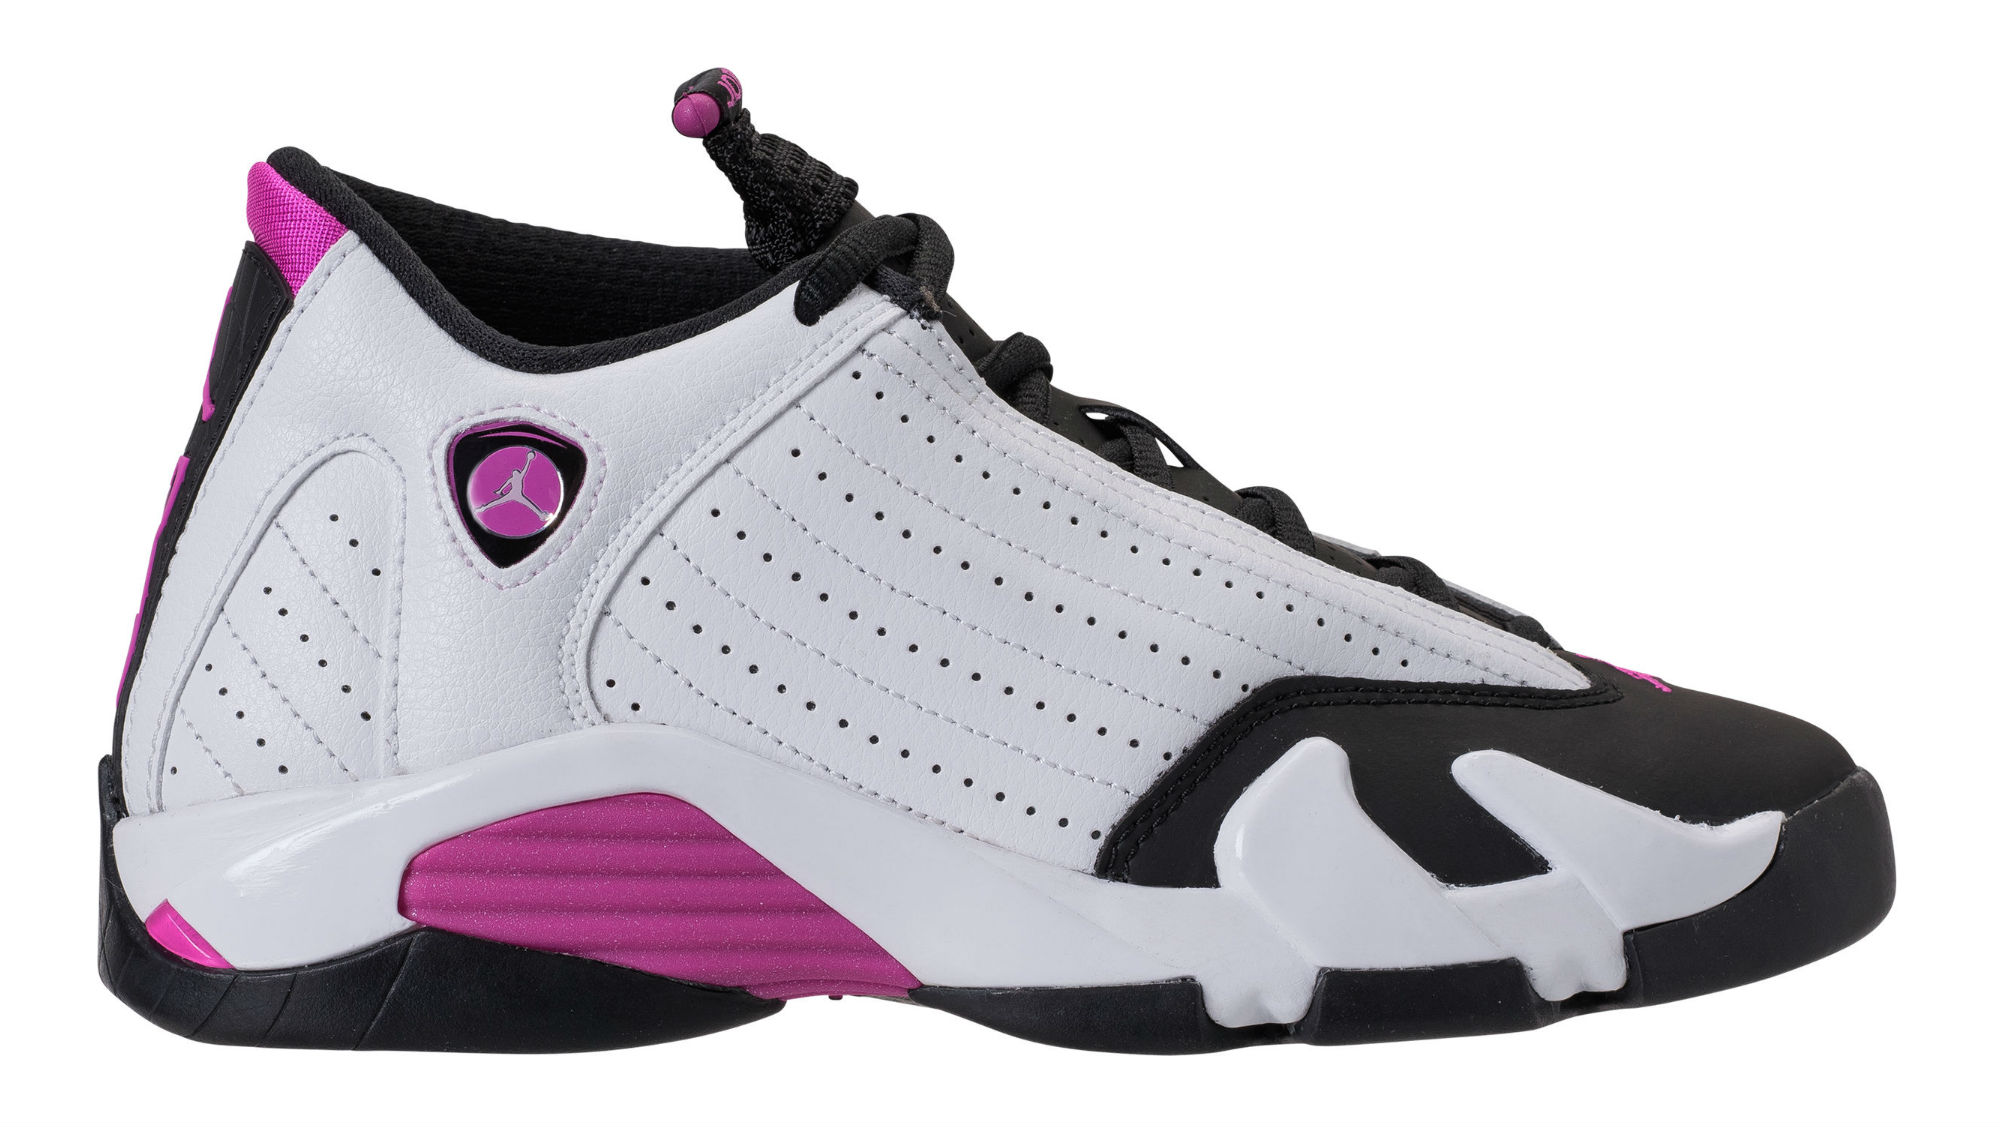 1b18feac822 Air Jordan 14 XIV Girls Fuchsia Blast Release Date 654969-119